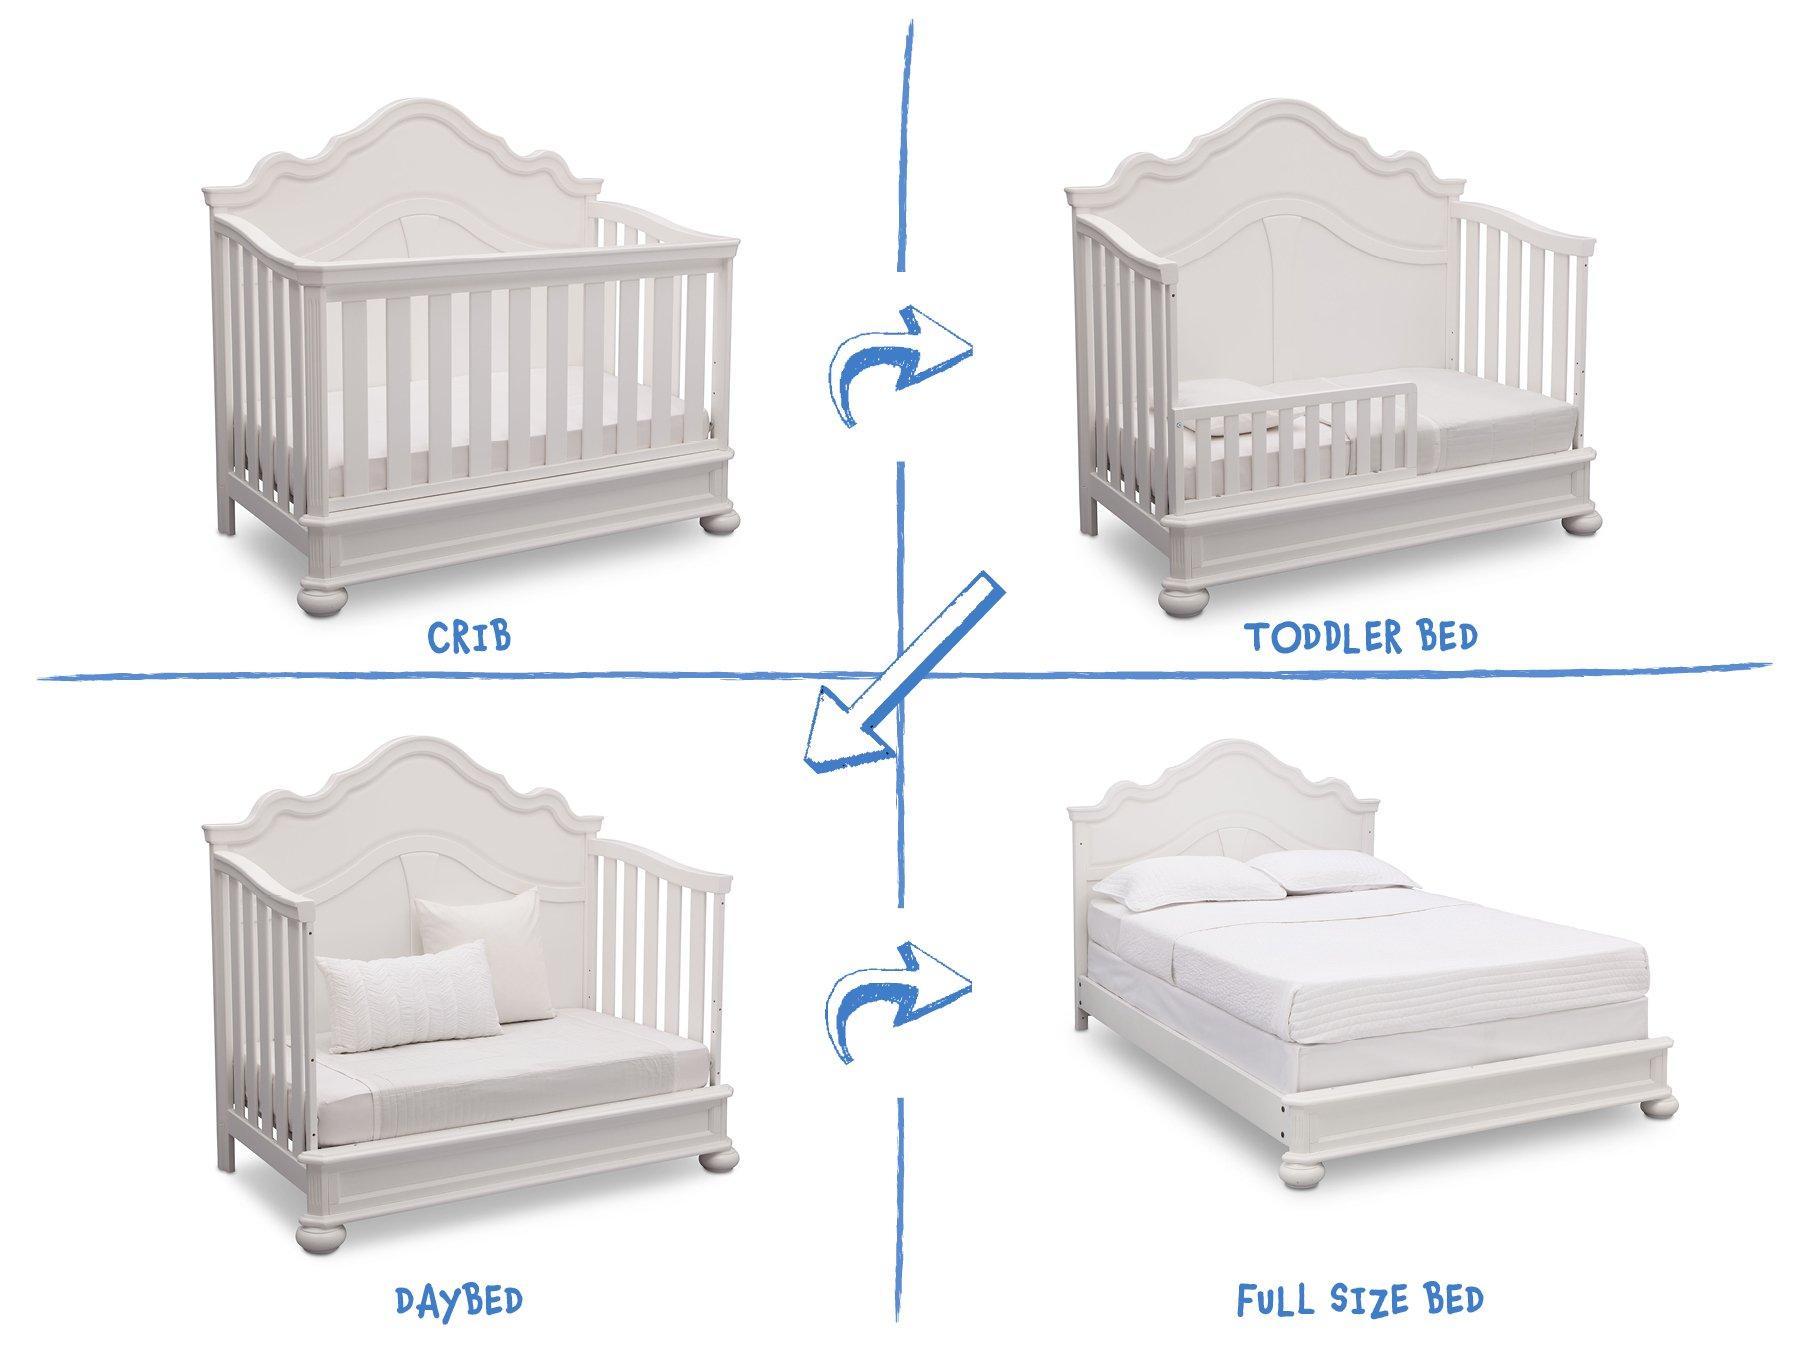 Simmons Kids Peyton 6-Piece Nursery Furniture Set (Convertible Crib, Dresser, Chest, Changing Top, Toddler Guardrail, Full Size Conversion), Bianca White by Delta Children (Image #4)